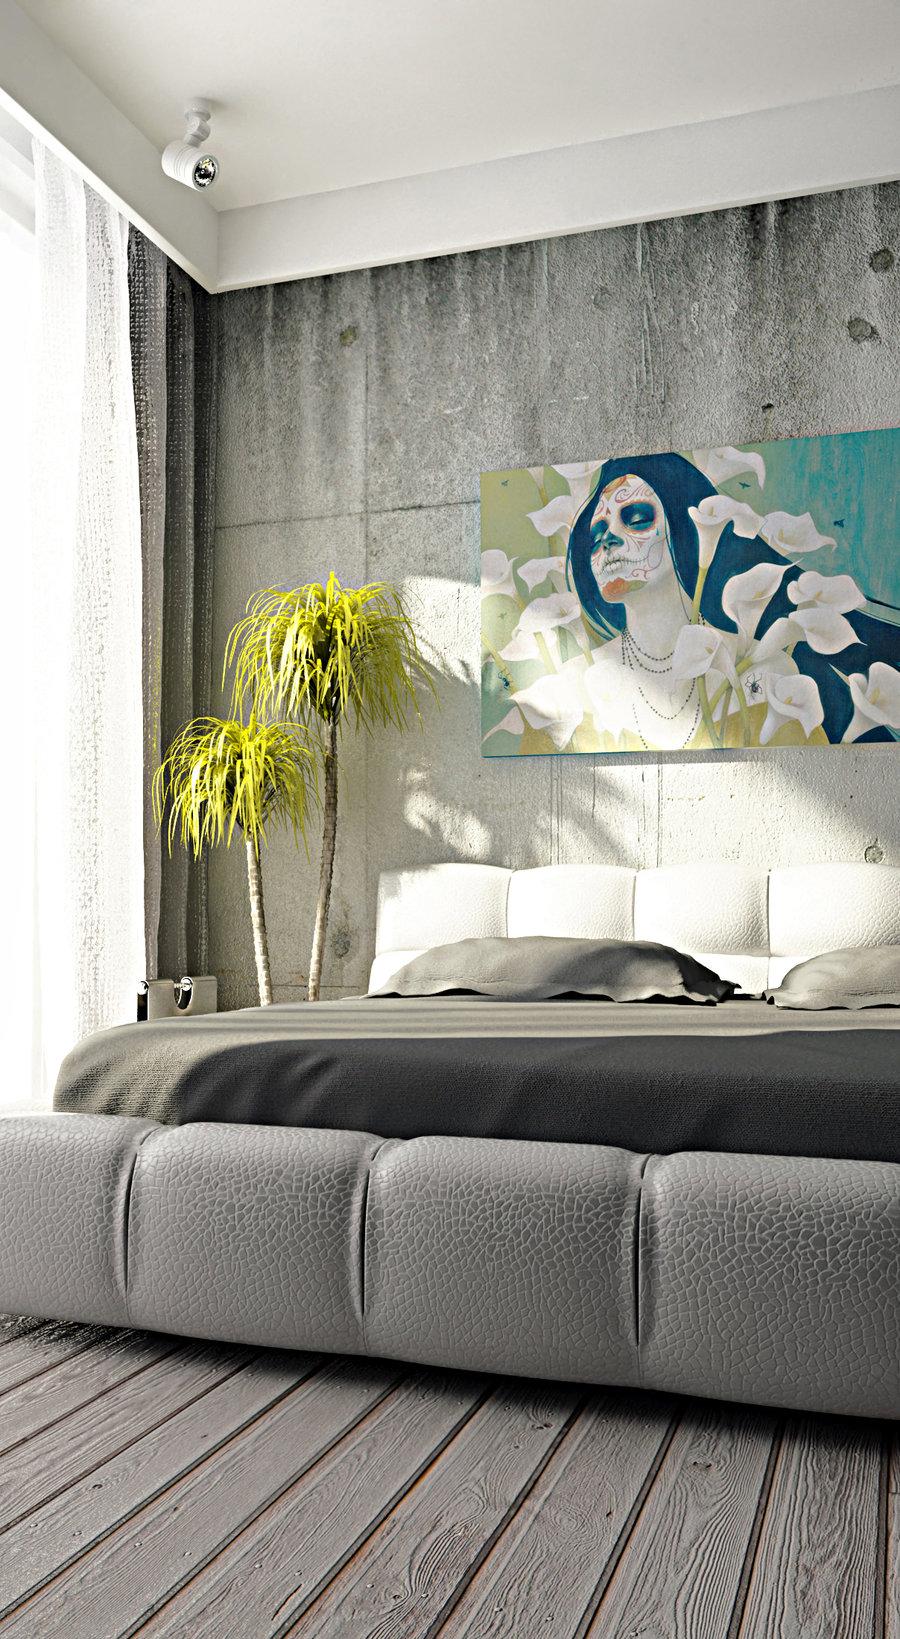 Interior Art Design  High Quality Background on Wallpapers Vista